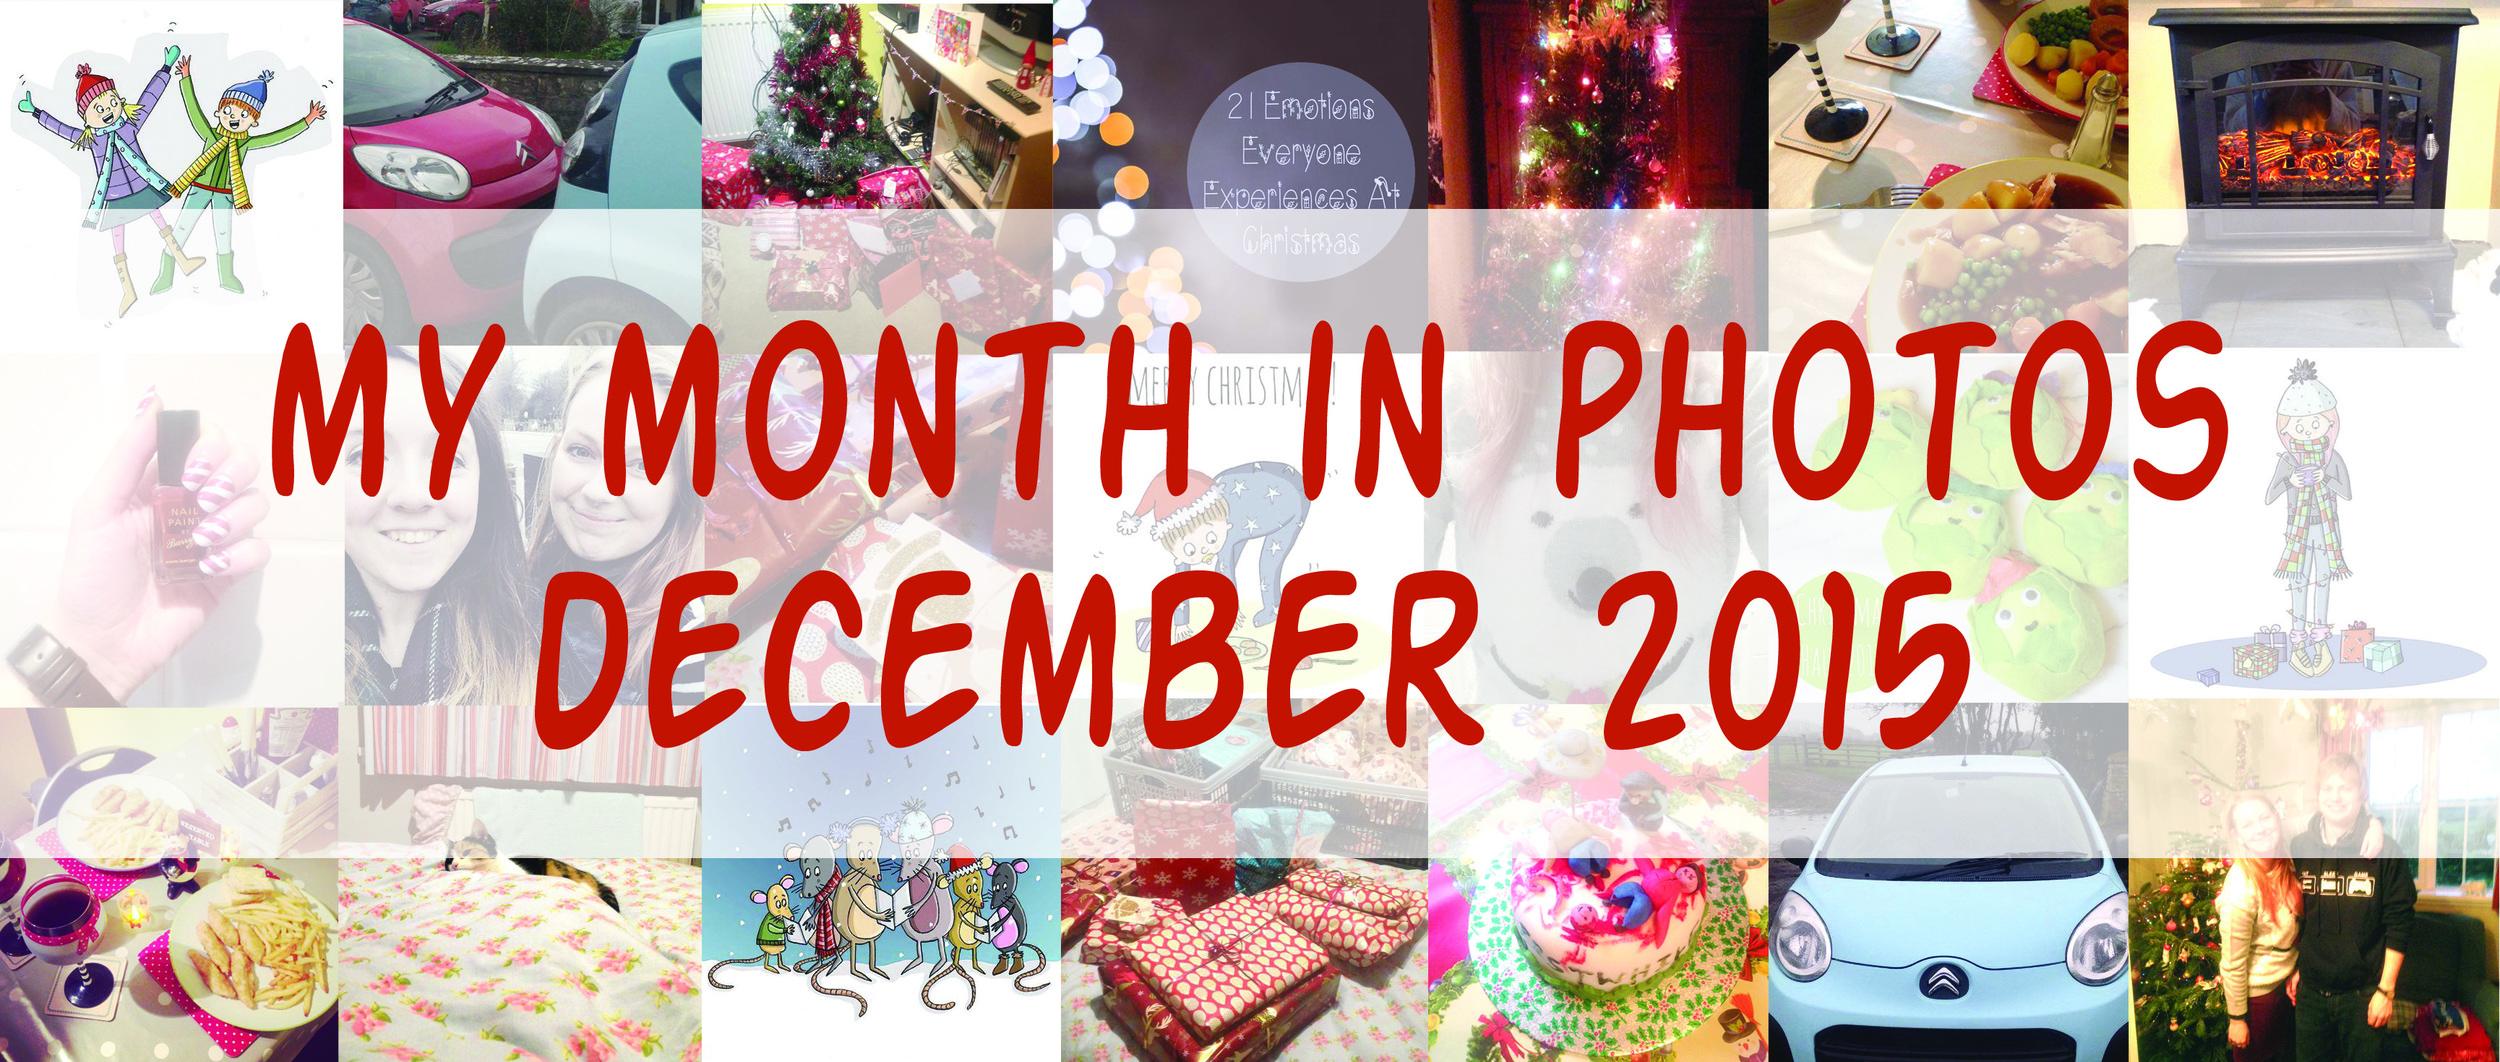 month photos dec 2015.jpg